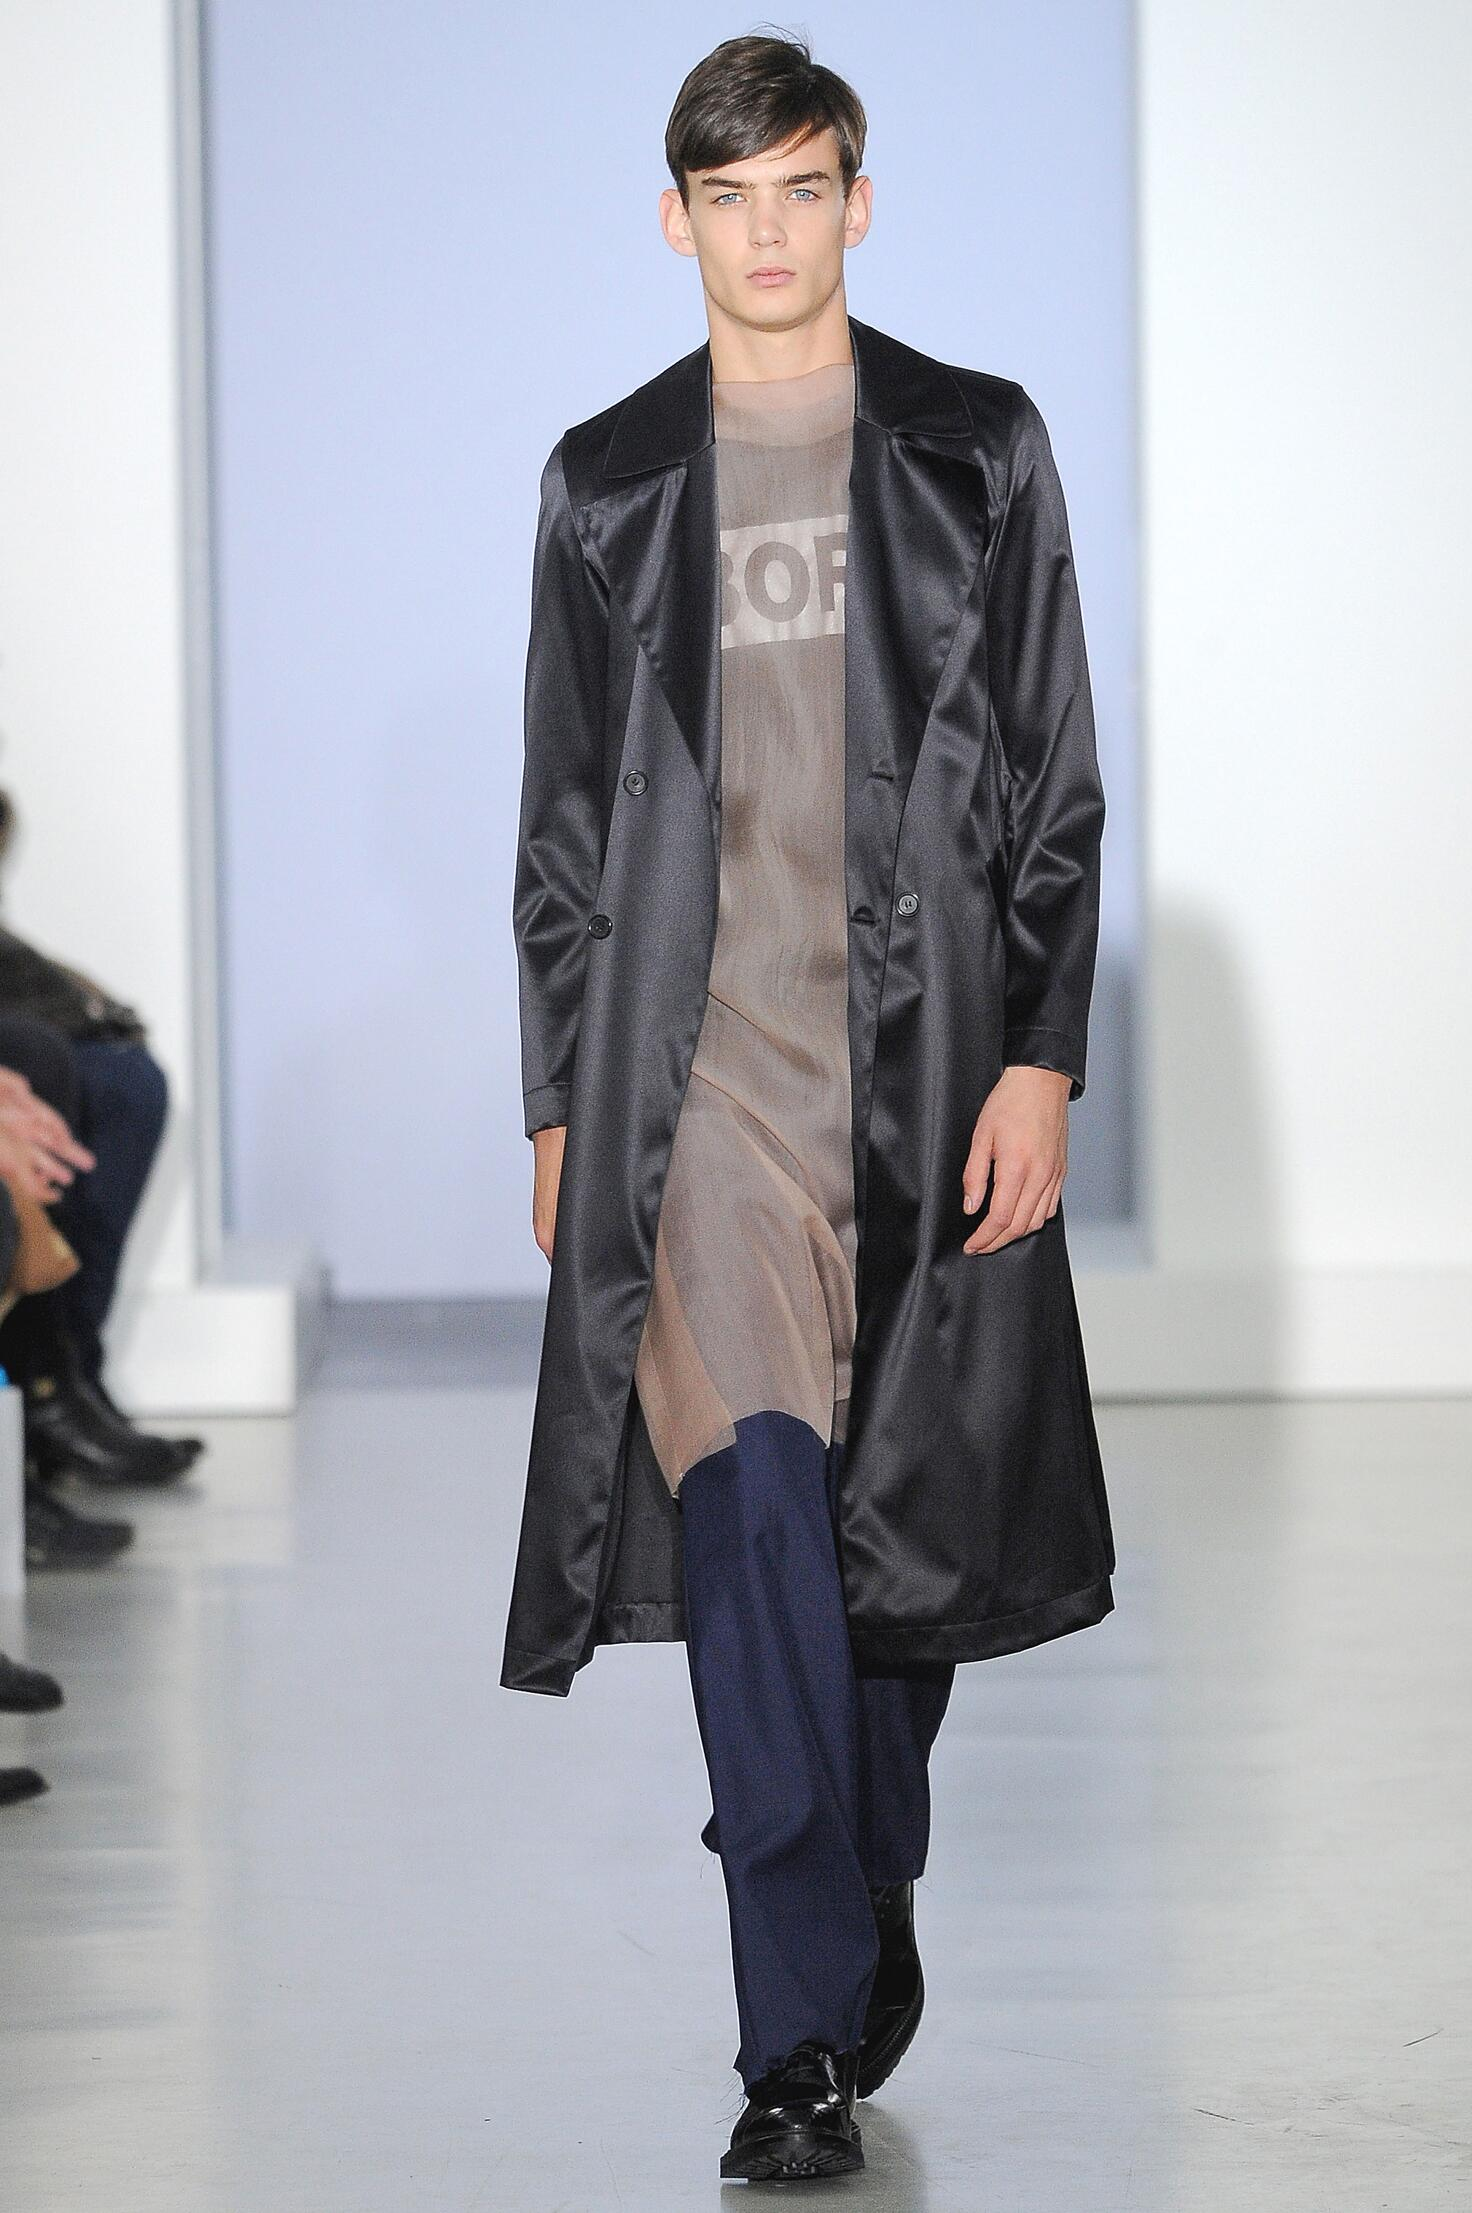 Summer Fashion Trends 2015 Yang Li